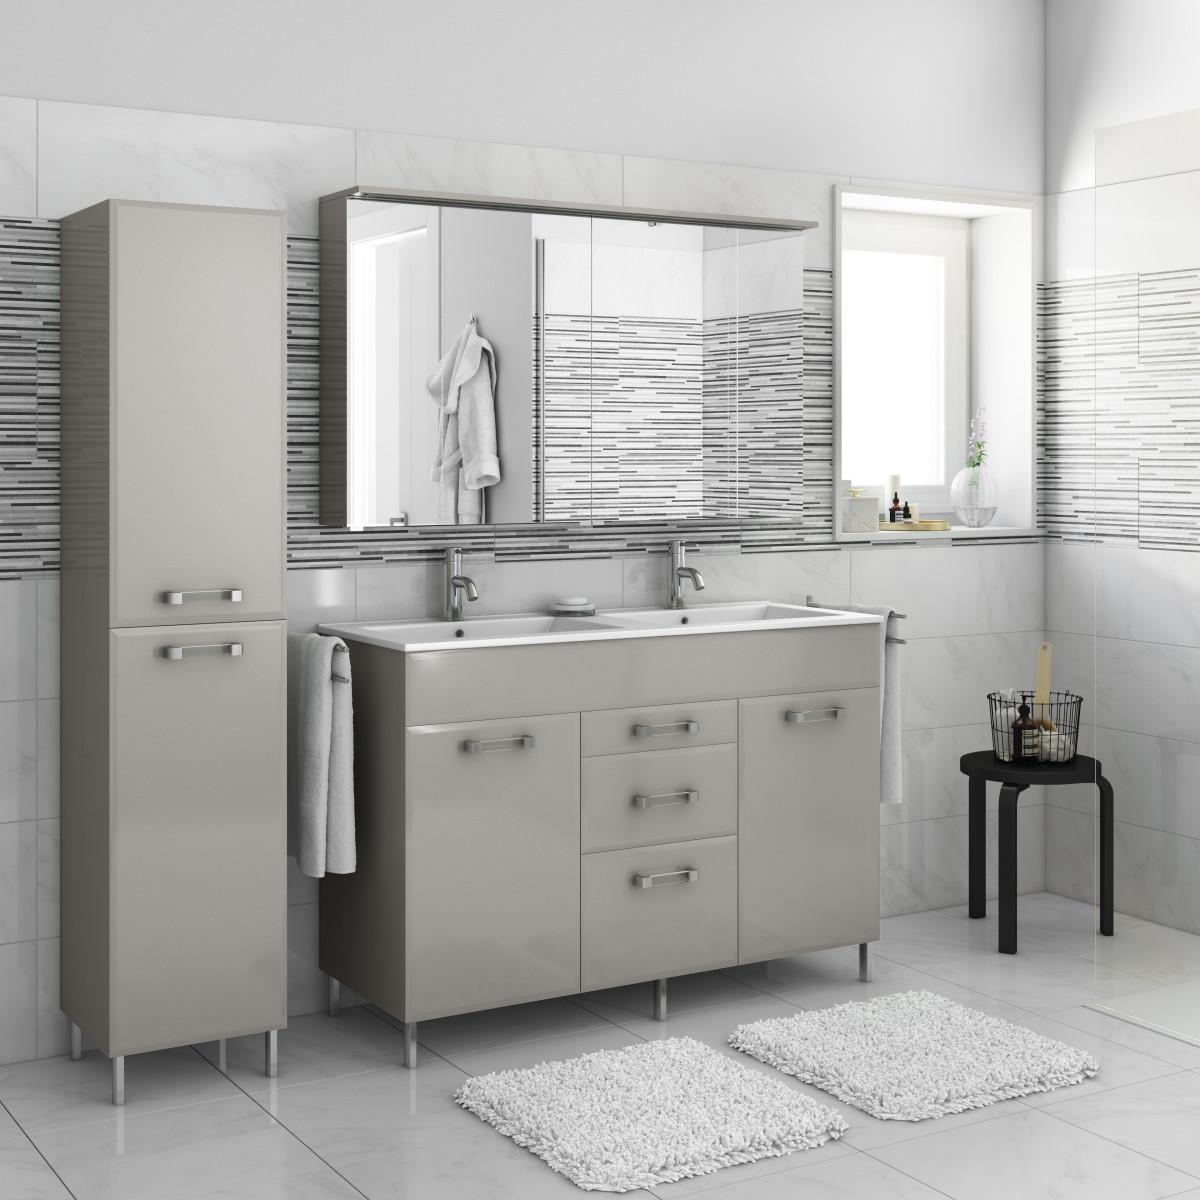 mobili sottolavabo bagno leroy merlin | sweetwaterrescue - Bagni Moderni Leroy Merlin